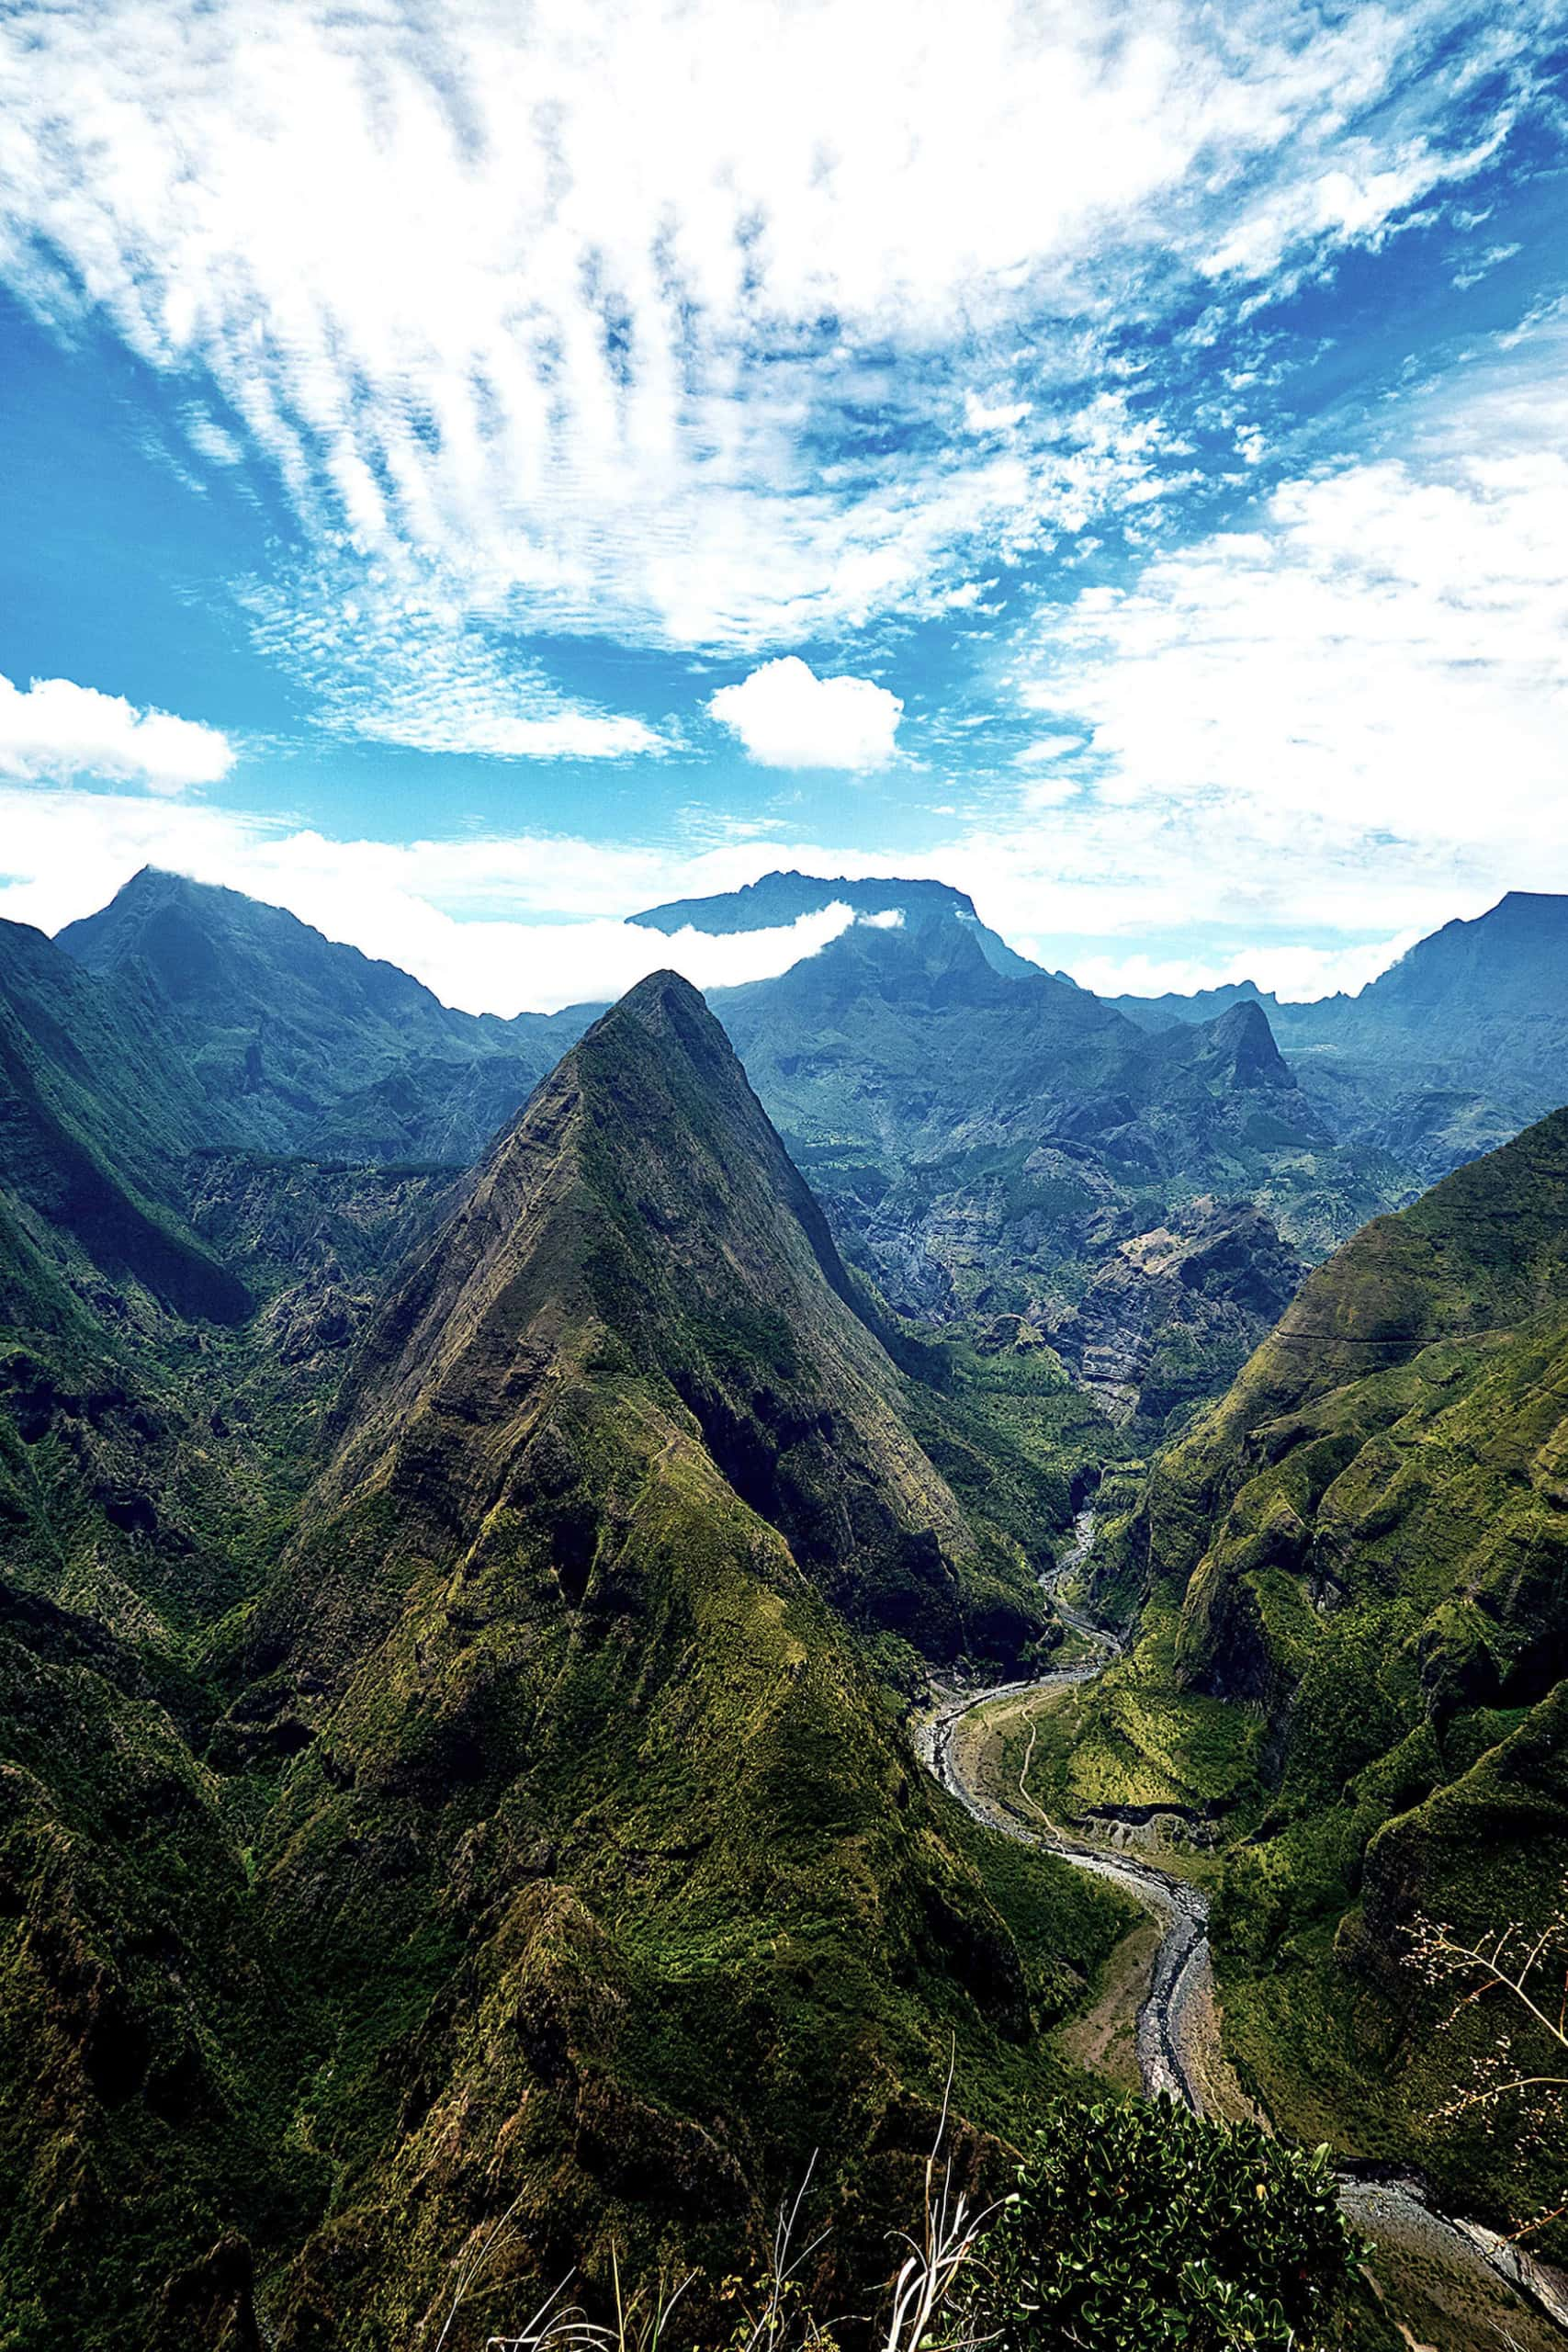 Montagne Mafate auf Insel in Afrika bei sonnigem Wetter